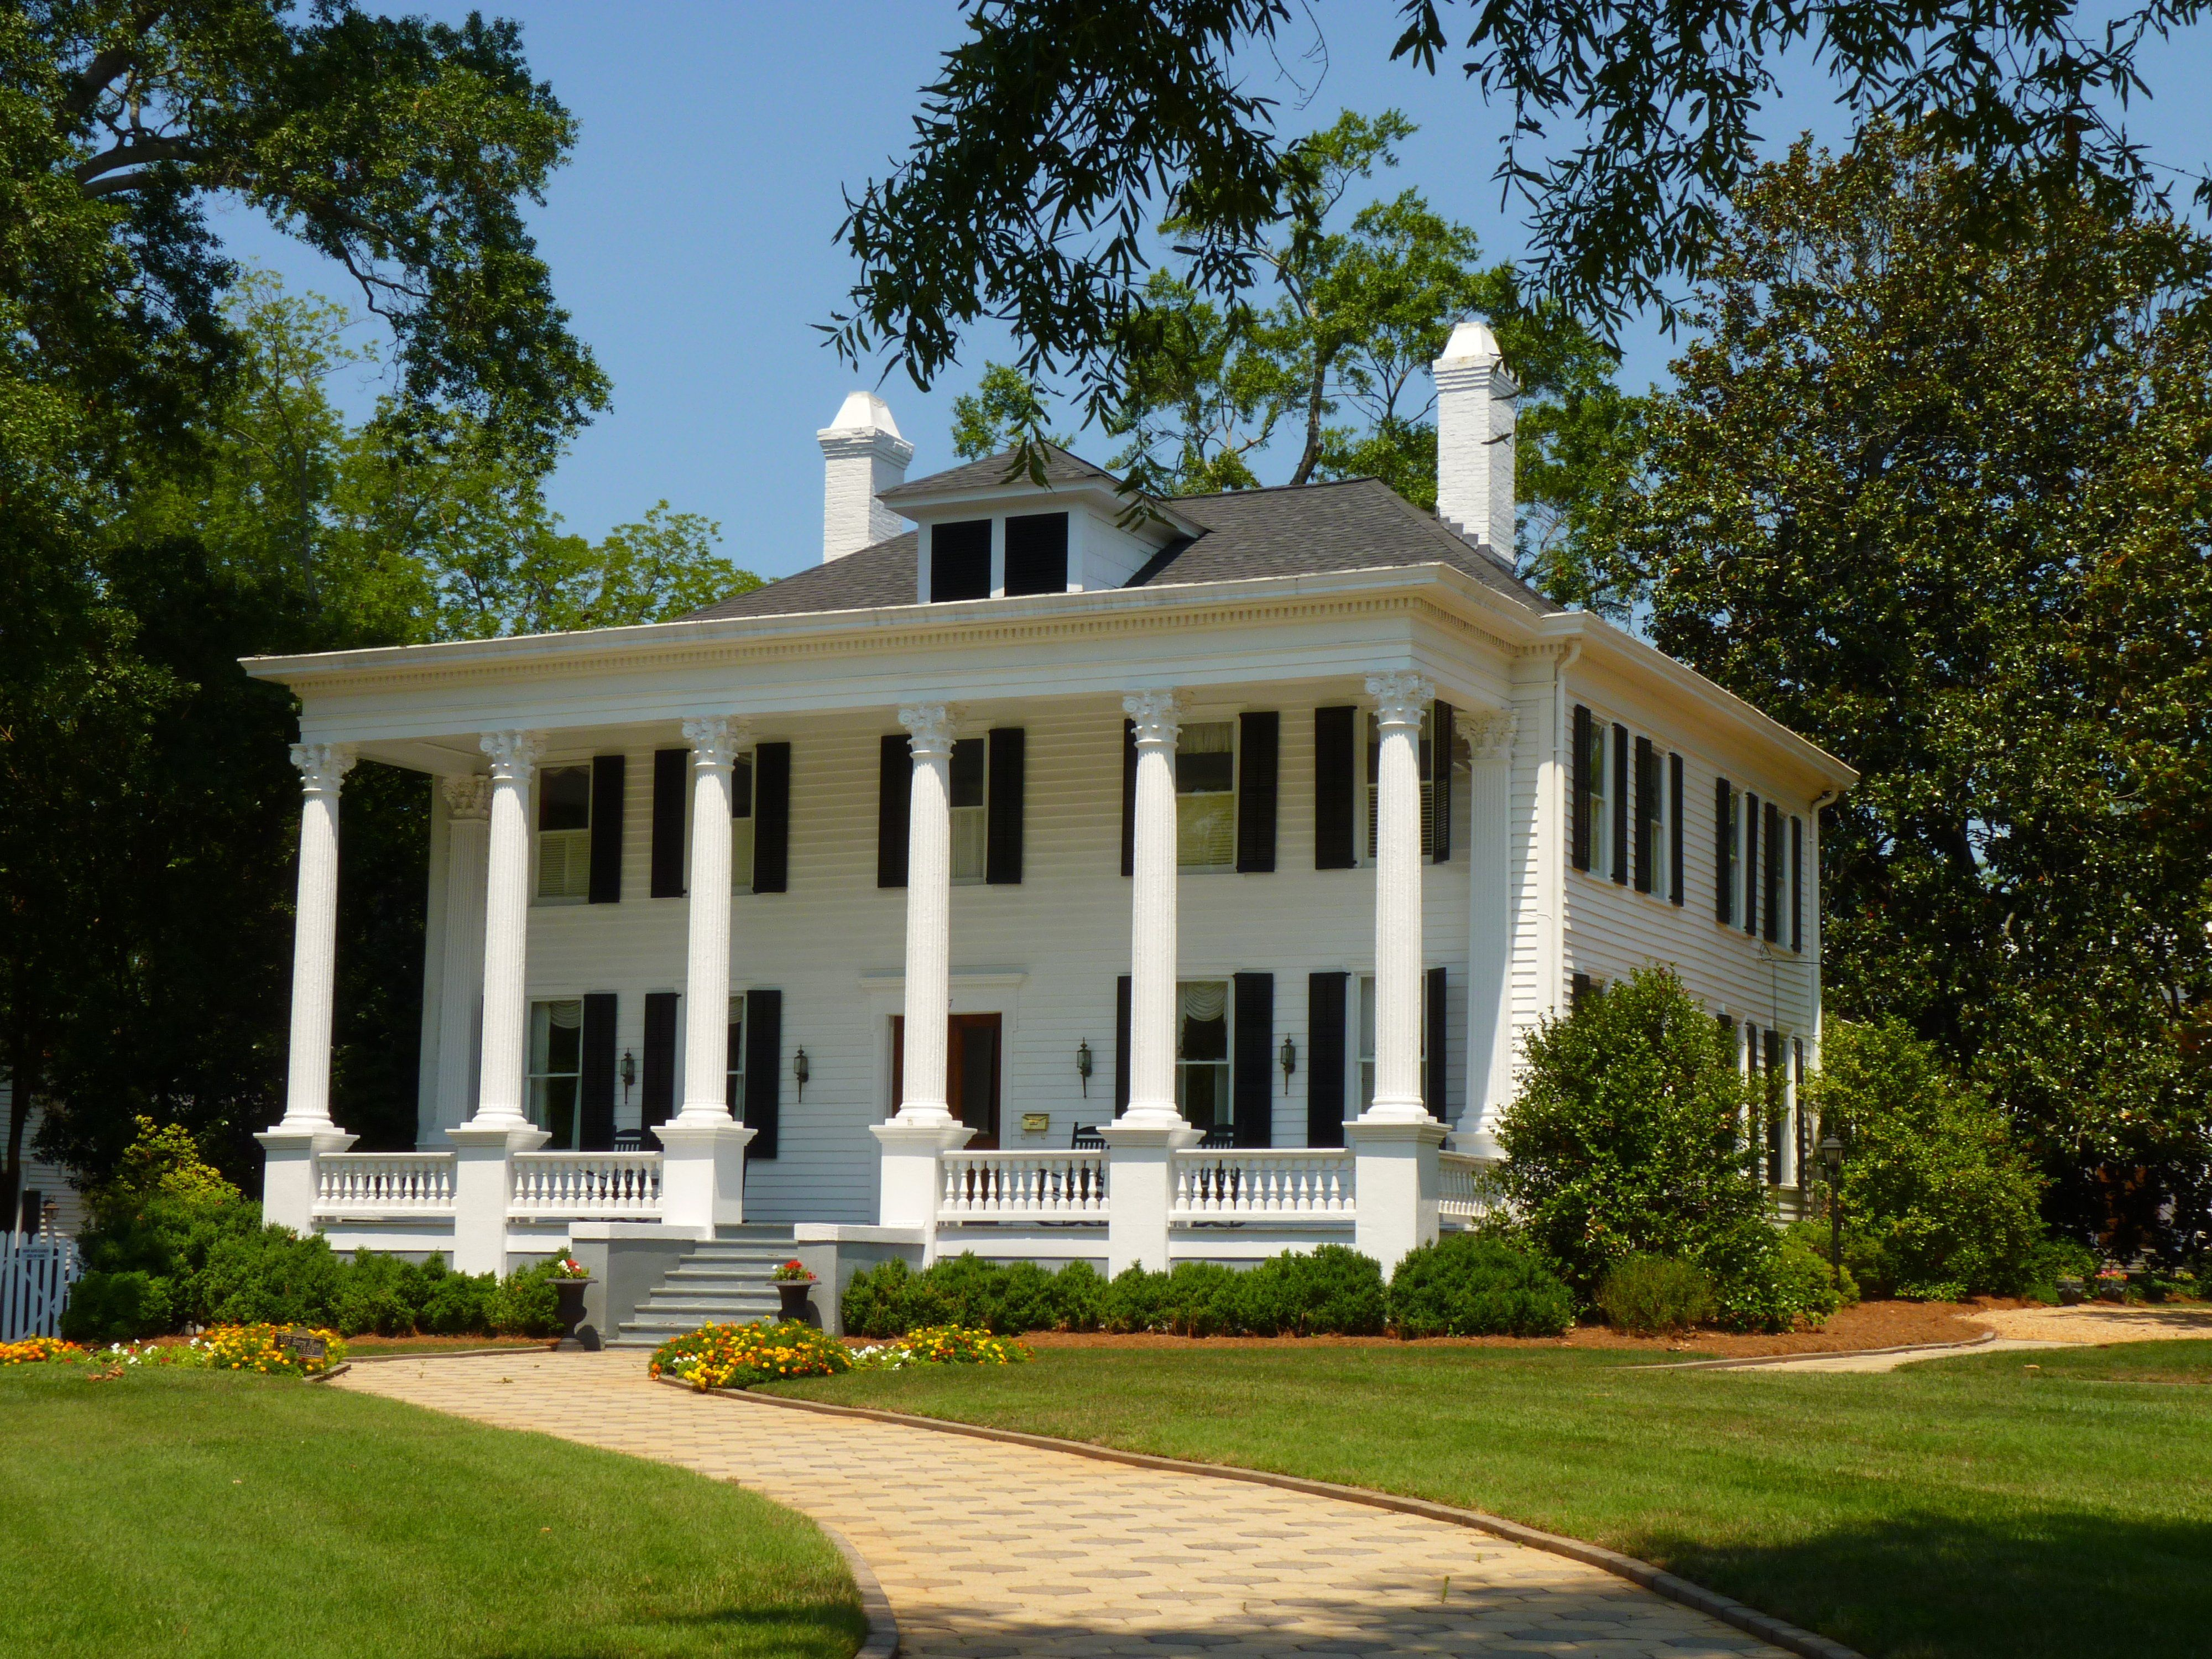 Madison georgia antebellum home beautiful south for Antebellum plantations for sale